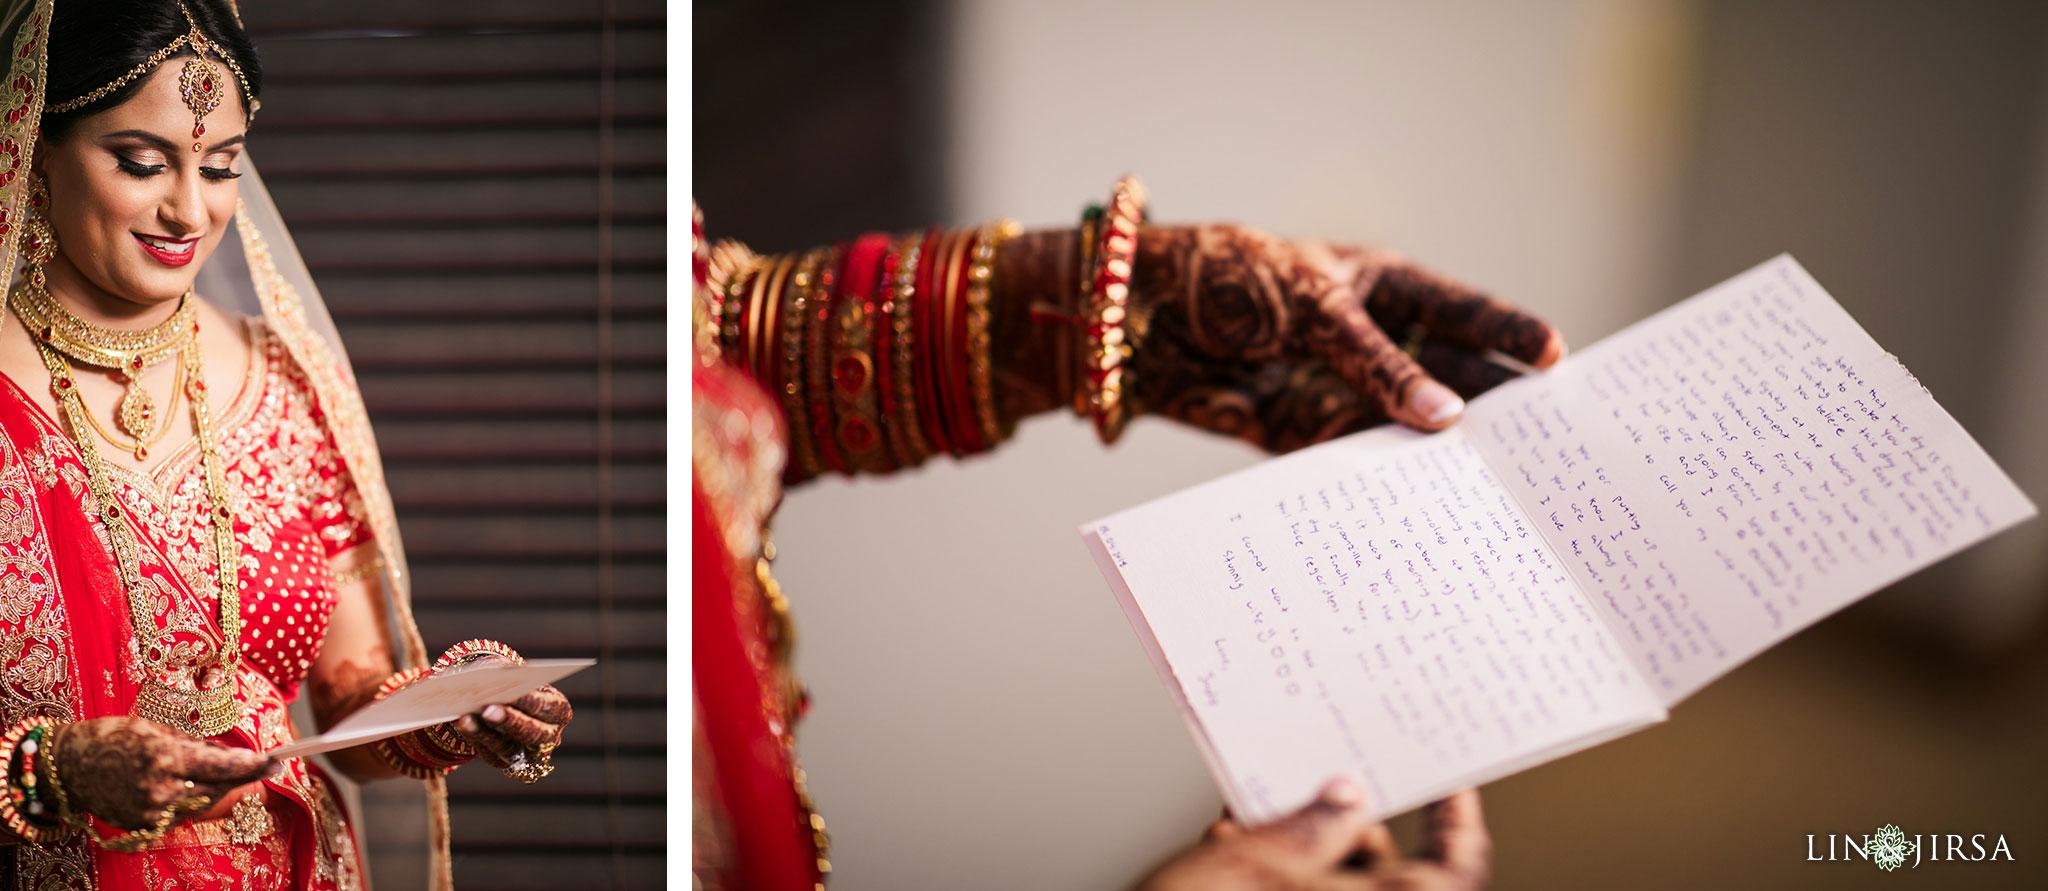 065 BAPS Swaminarayan Sanstha Chino Hills Indian Wedding Photography